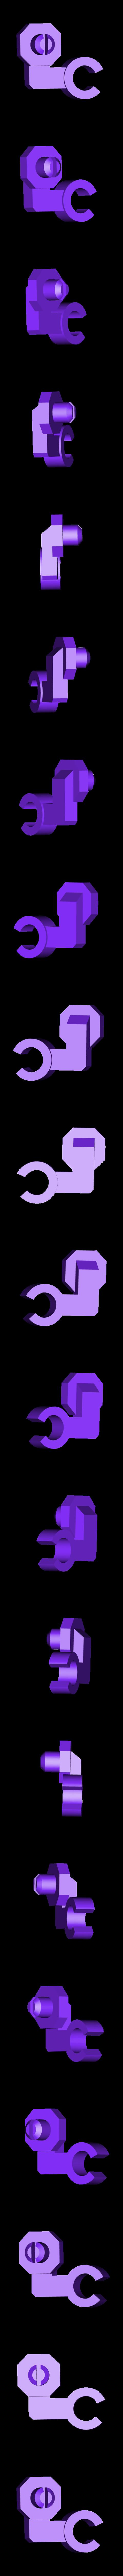 Robotto_Left_Arm.stl Download free STL file Robotto • 3D print design, Zortrax